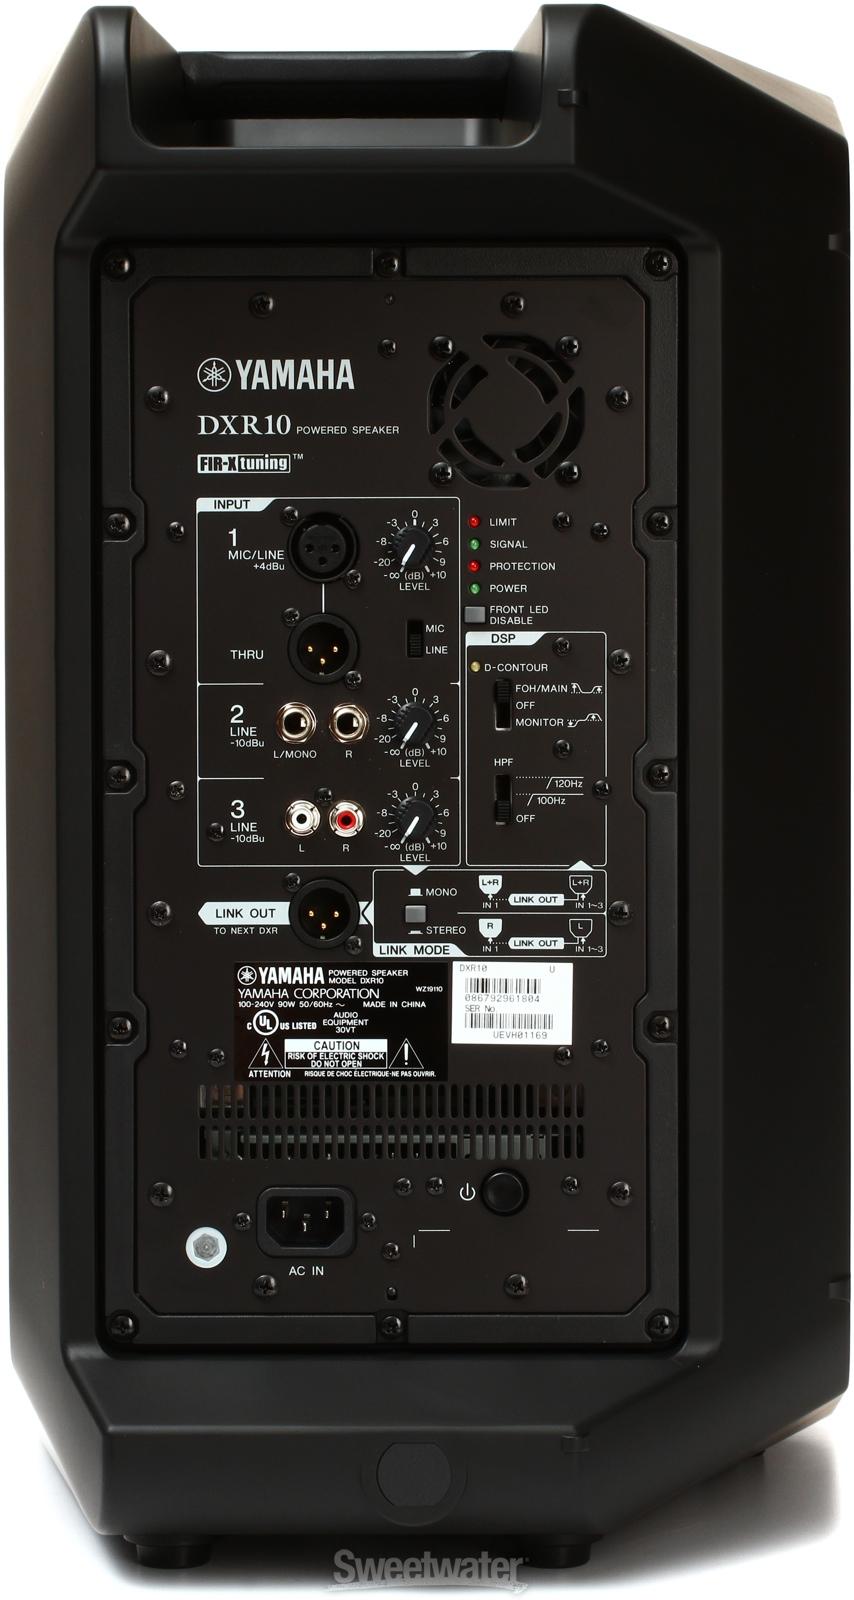 Brand new yamaha dxr10 1100w 10 active speaker free fast for Yamaha dxr10 speakers